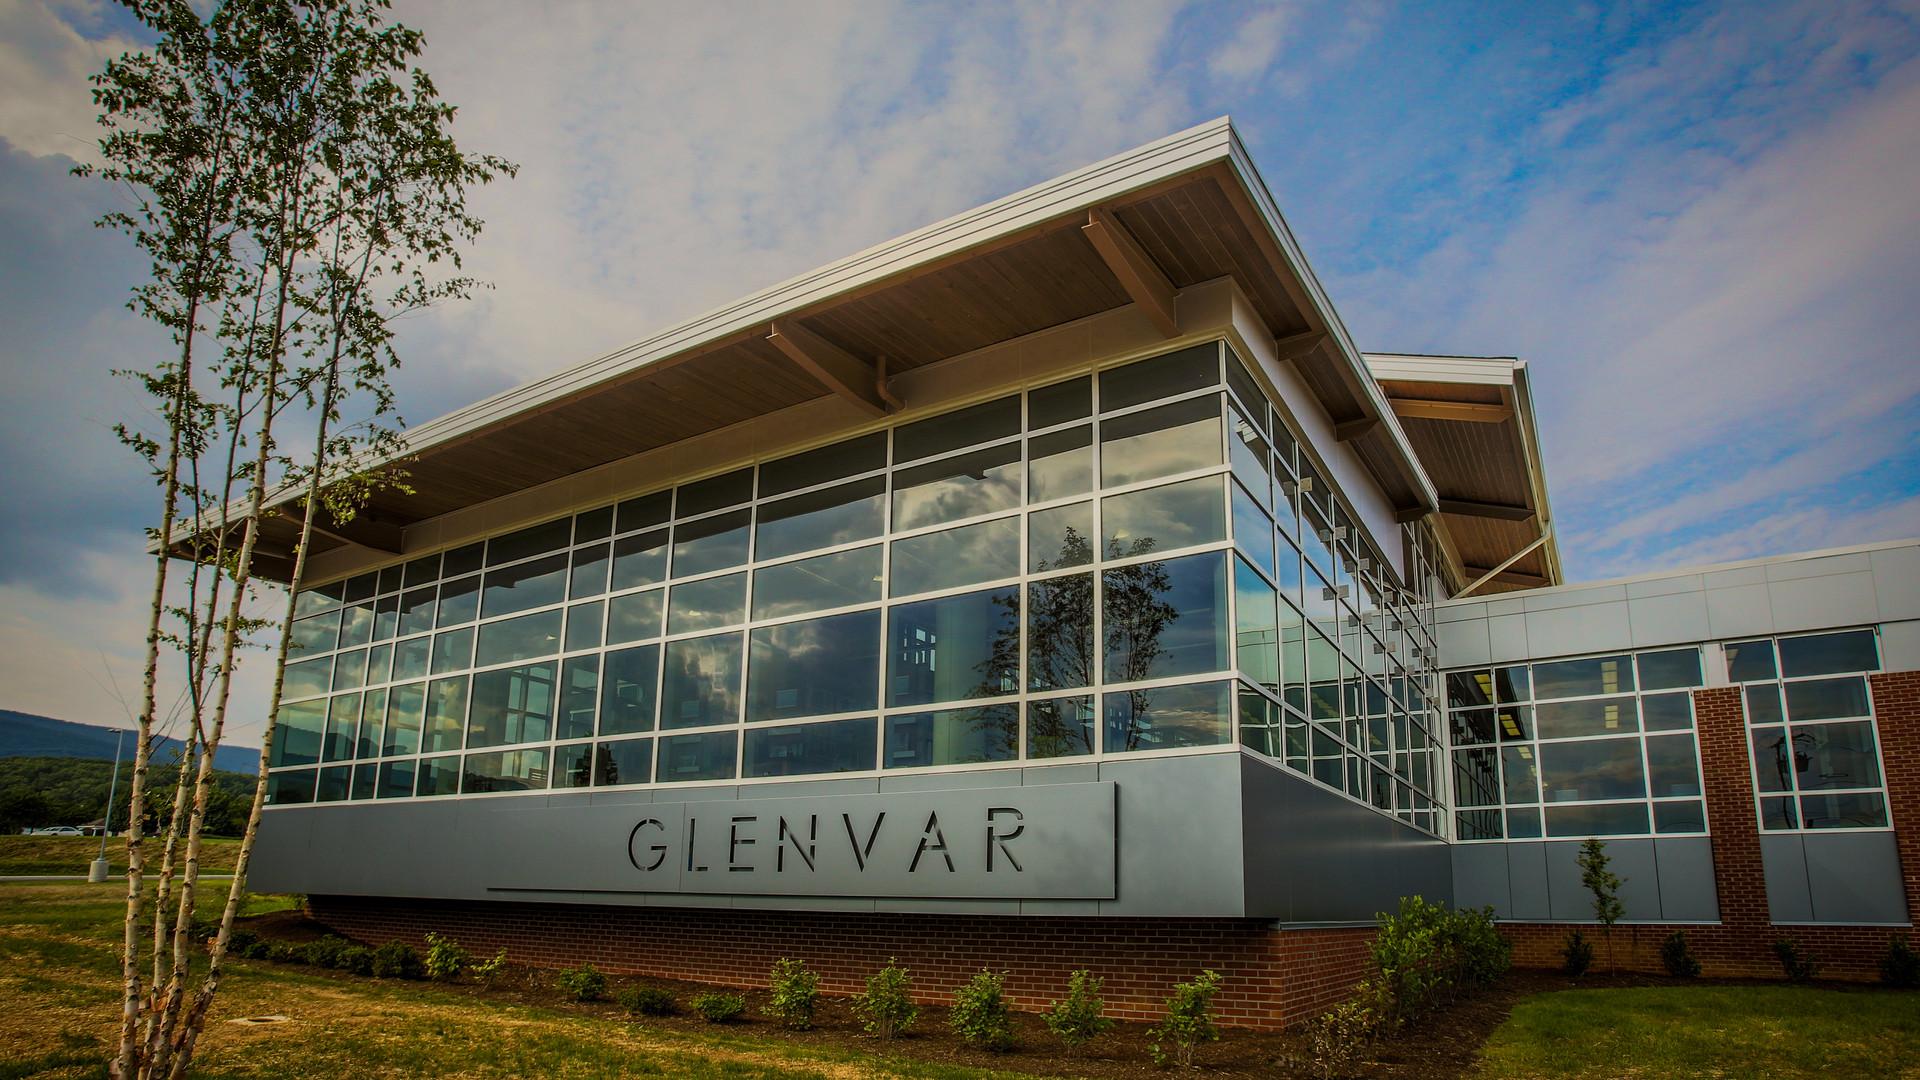 Copy of Roanoke Glenvar